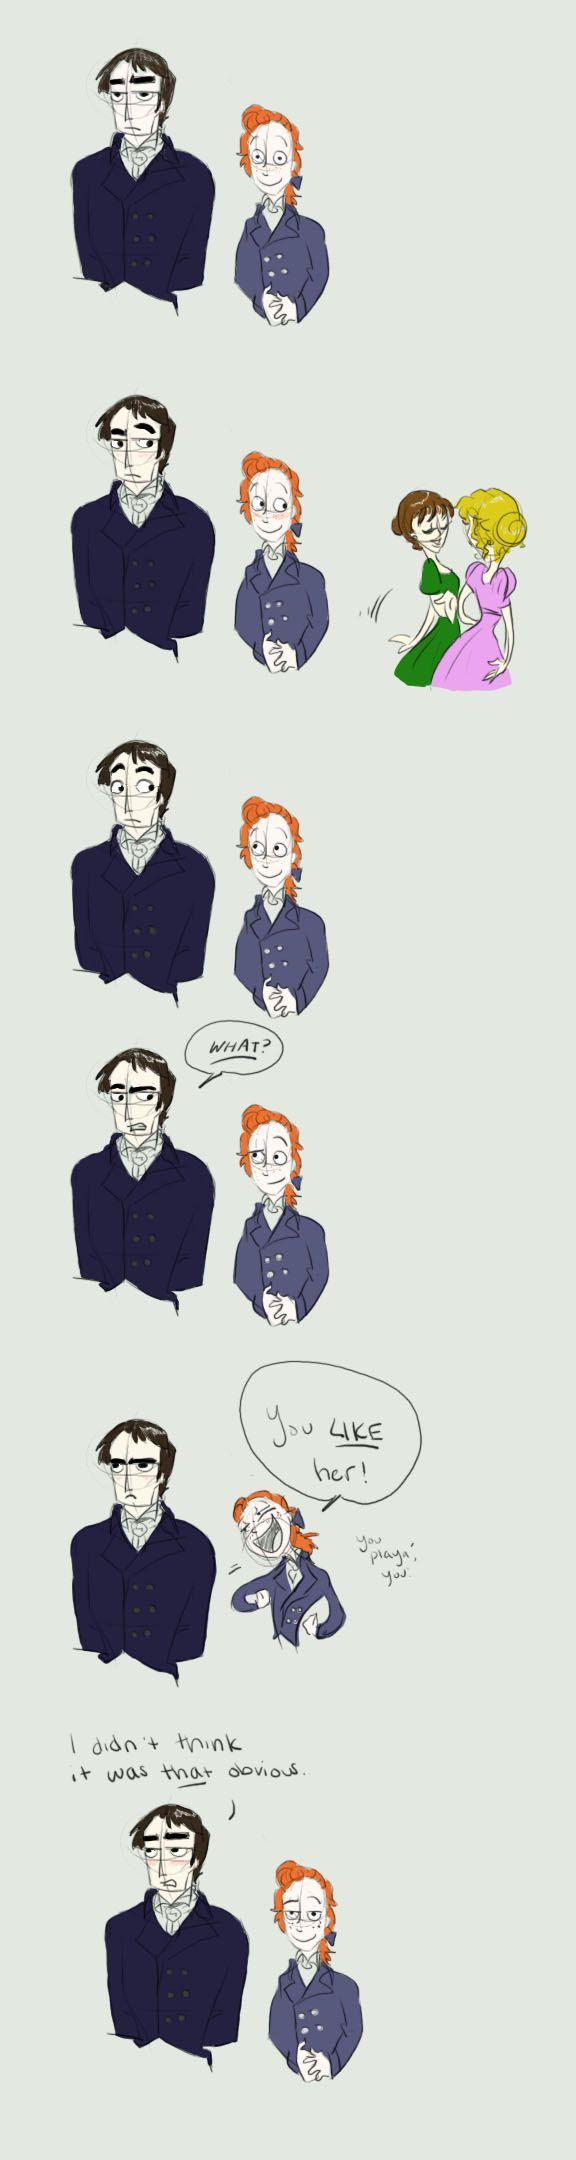 Darcy and Bingley.